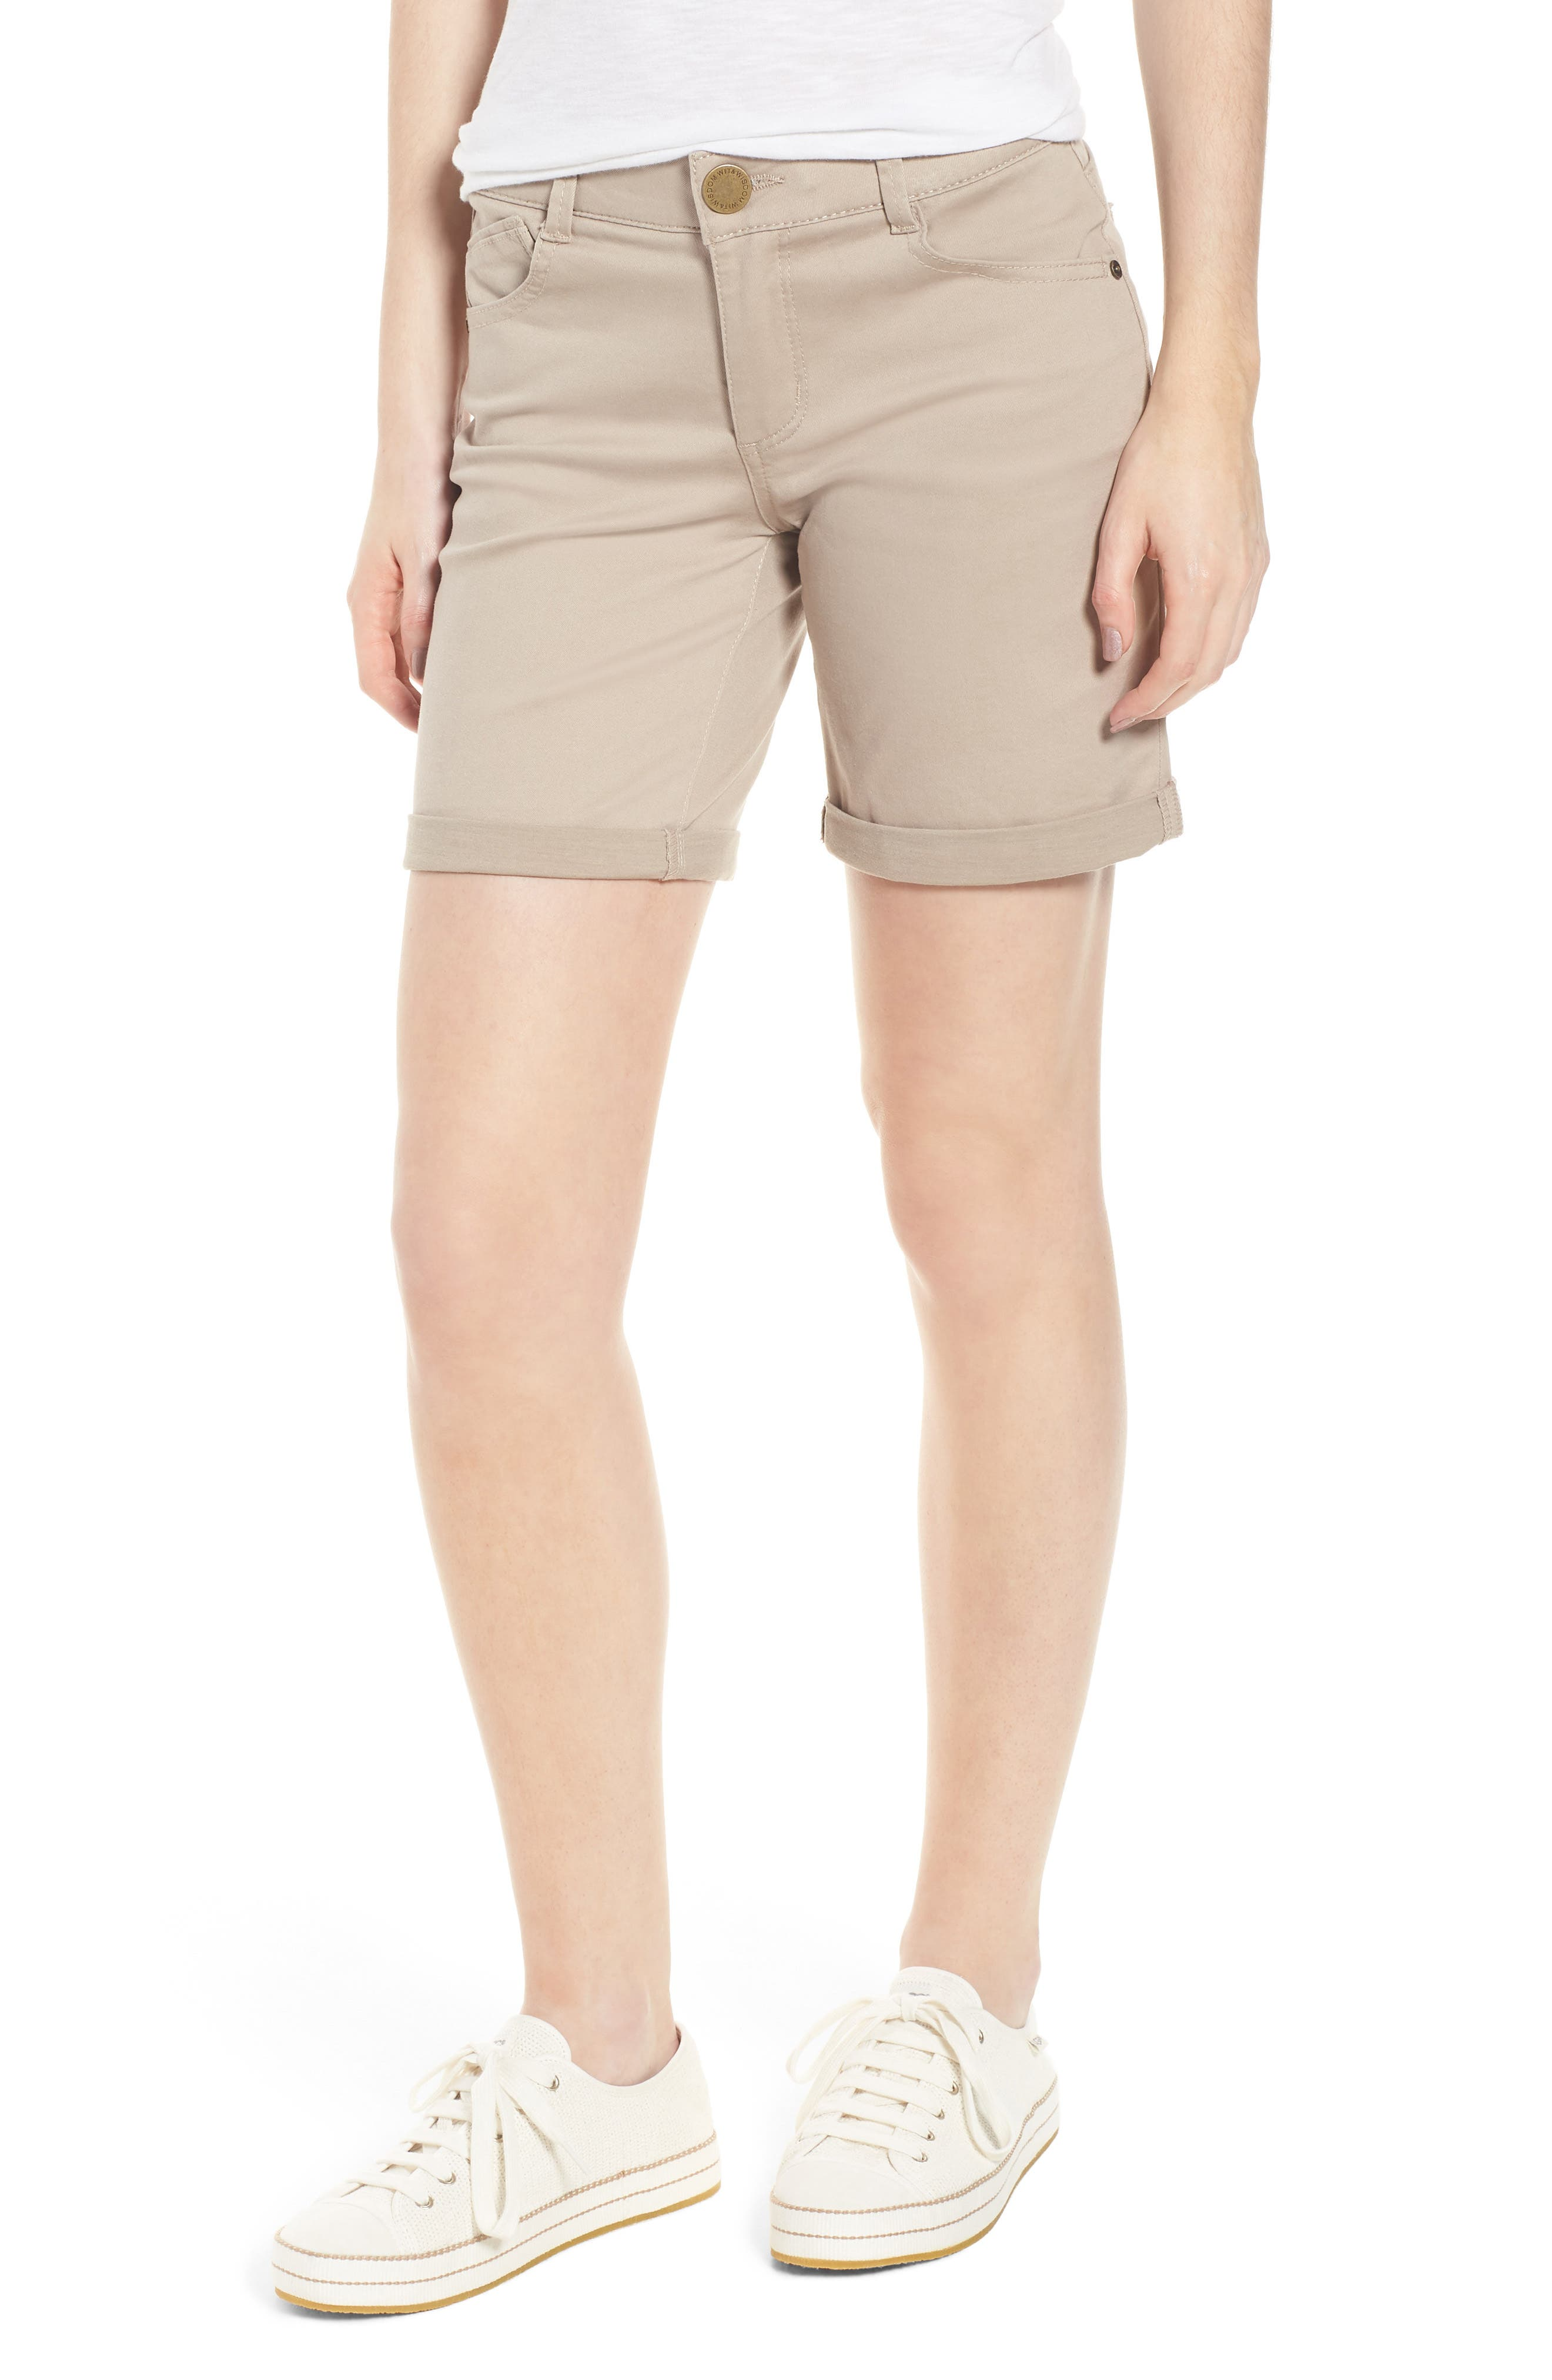 Wit & Wisdom Ab-Solution Stretch Cotton Shorts